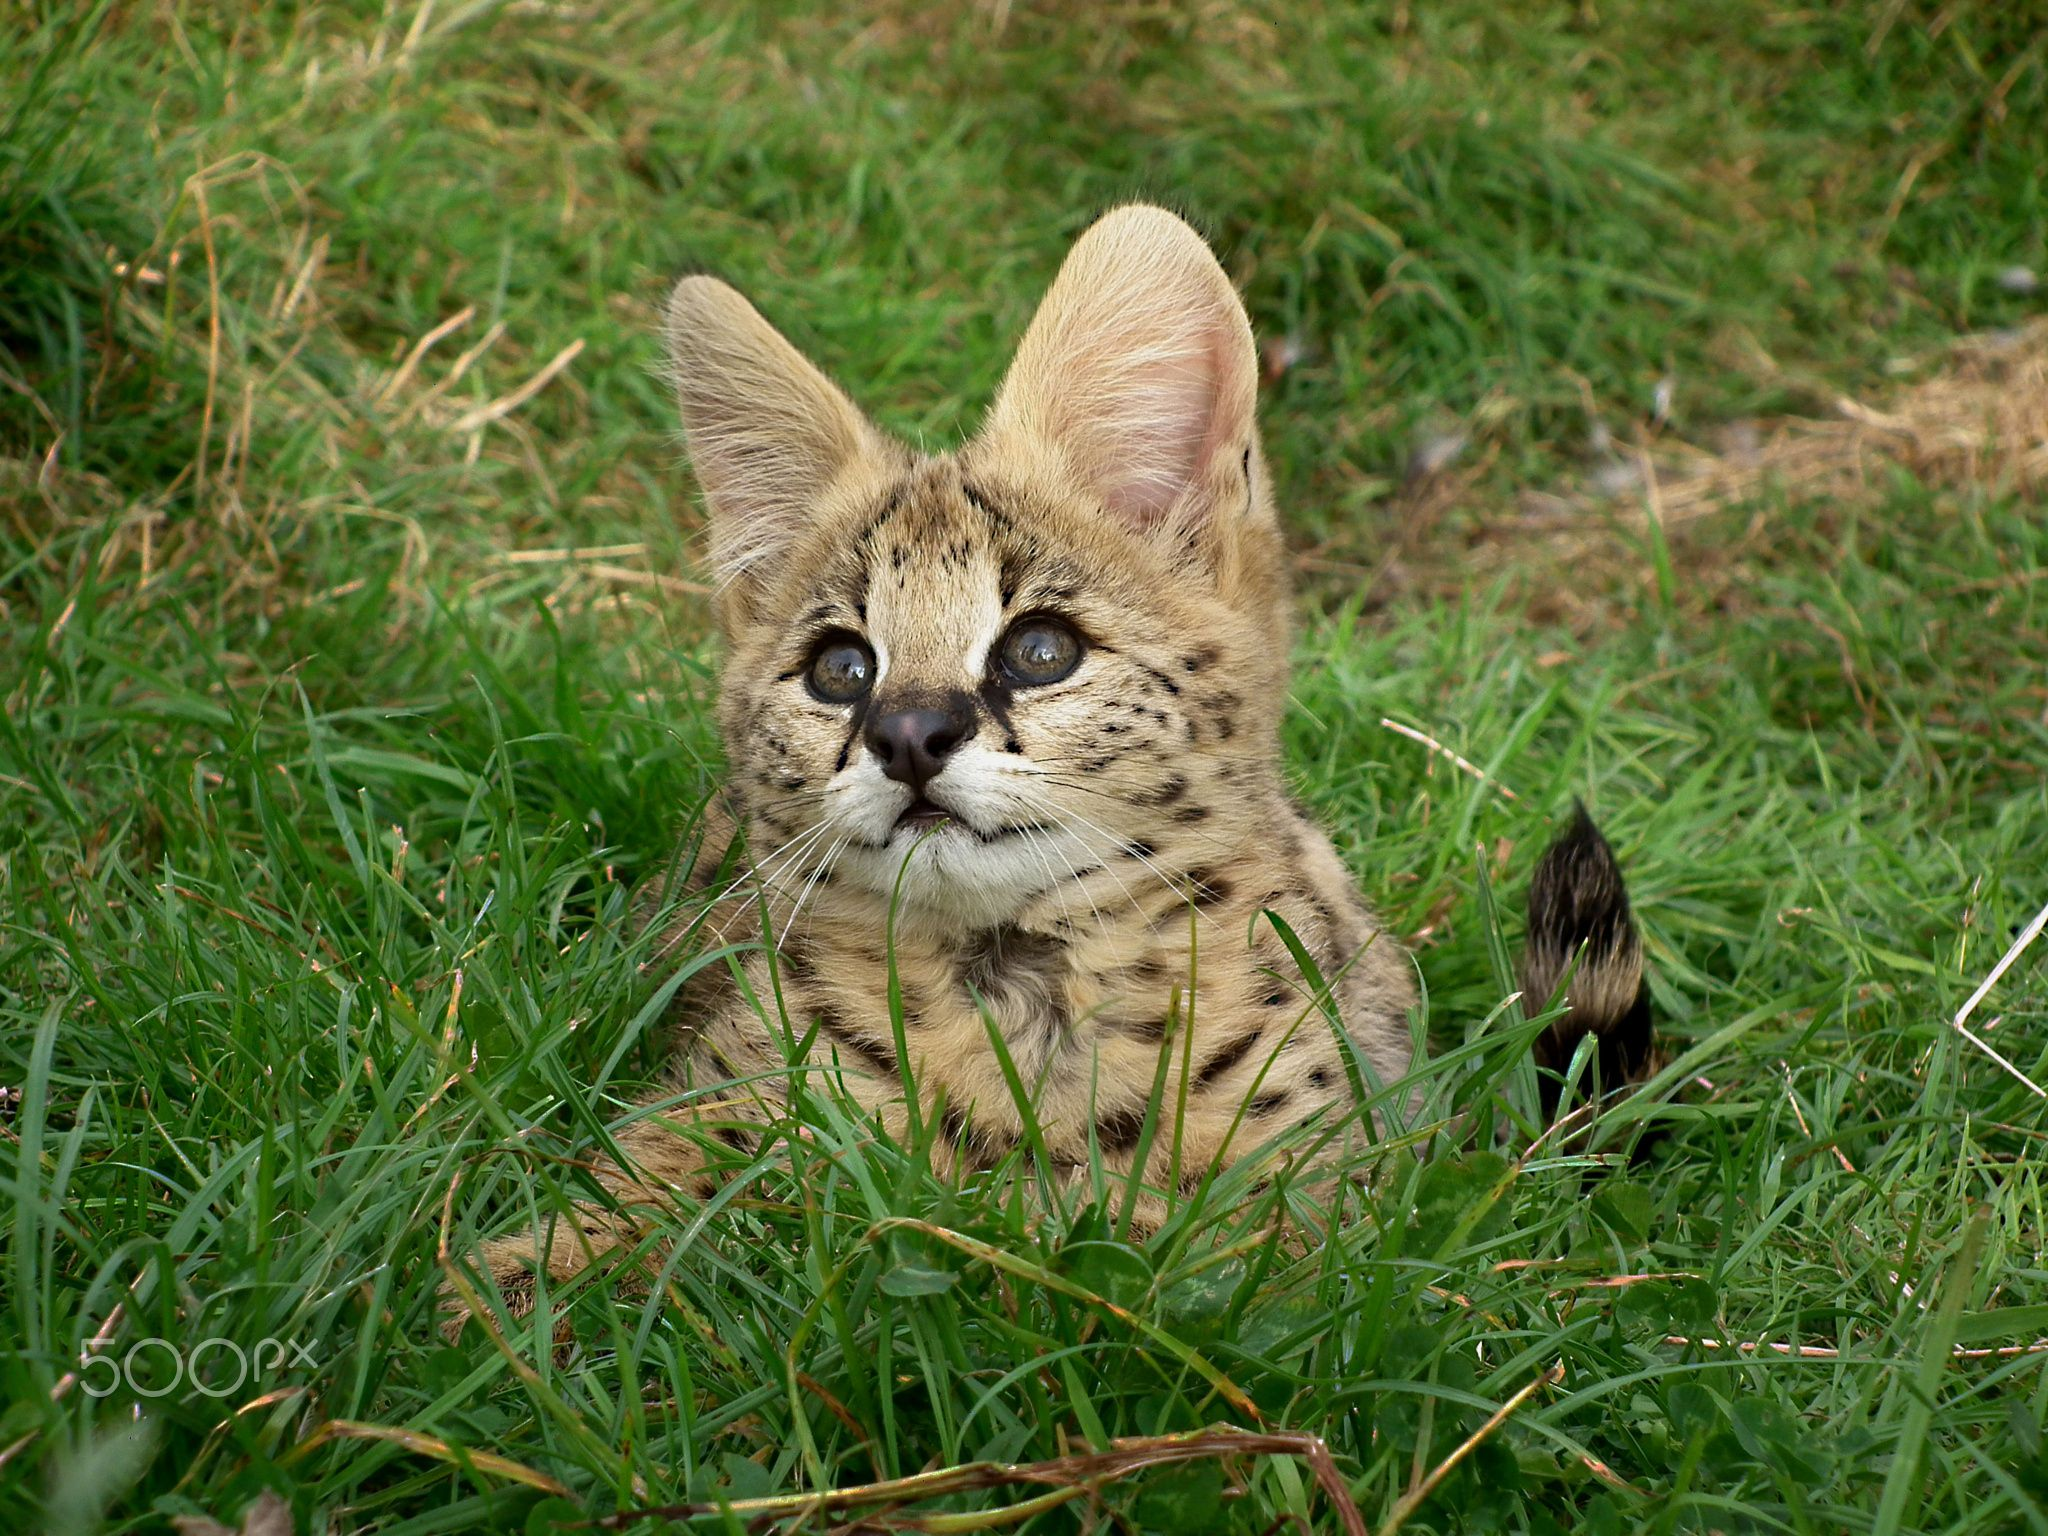 Young Serval Kitten Serval Kitten Serval Serval Cats